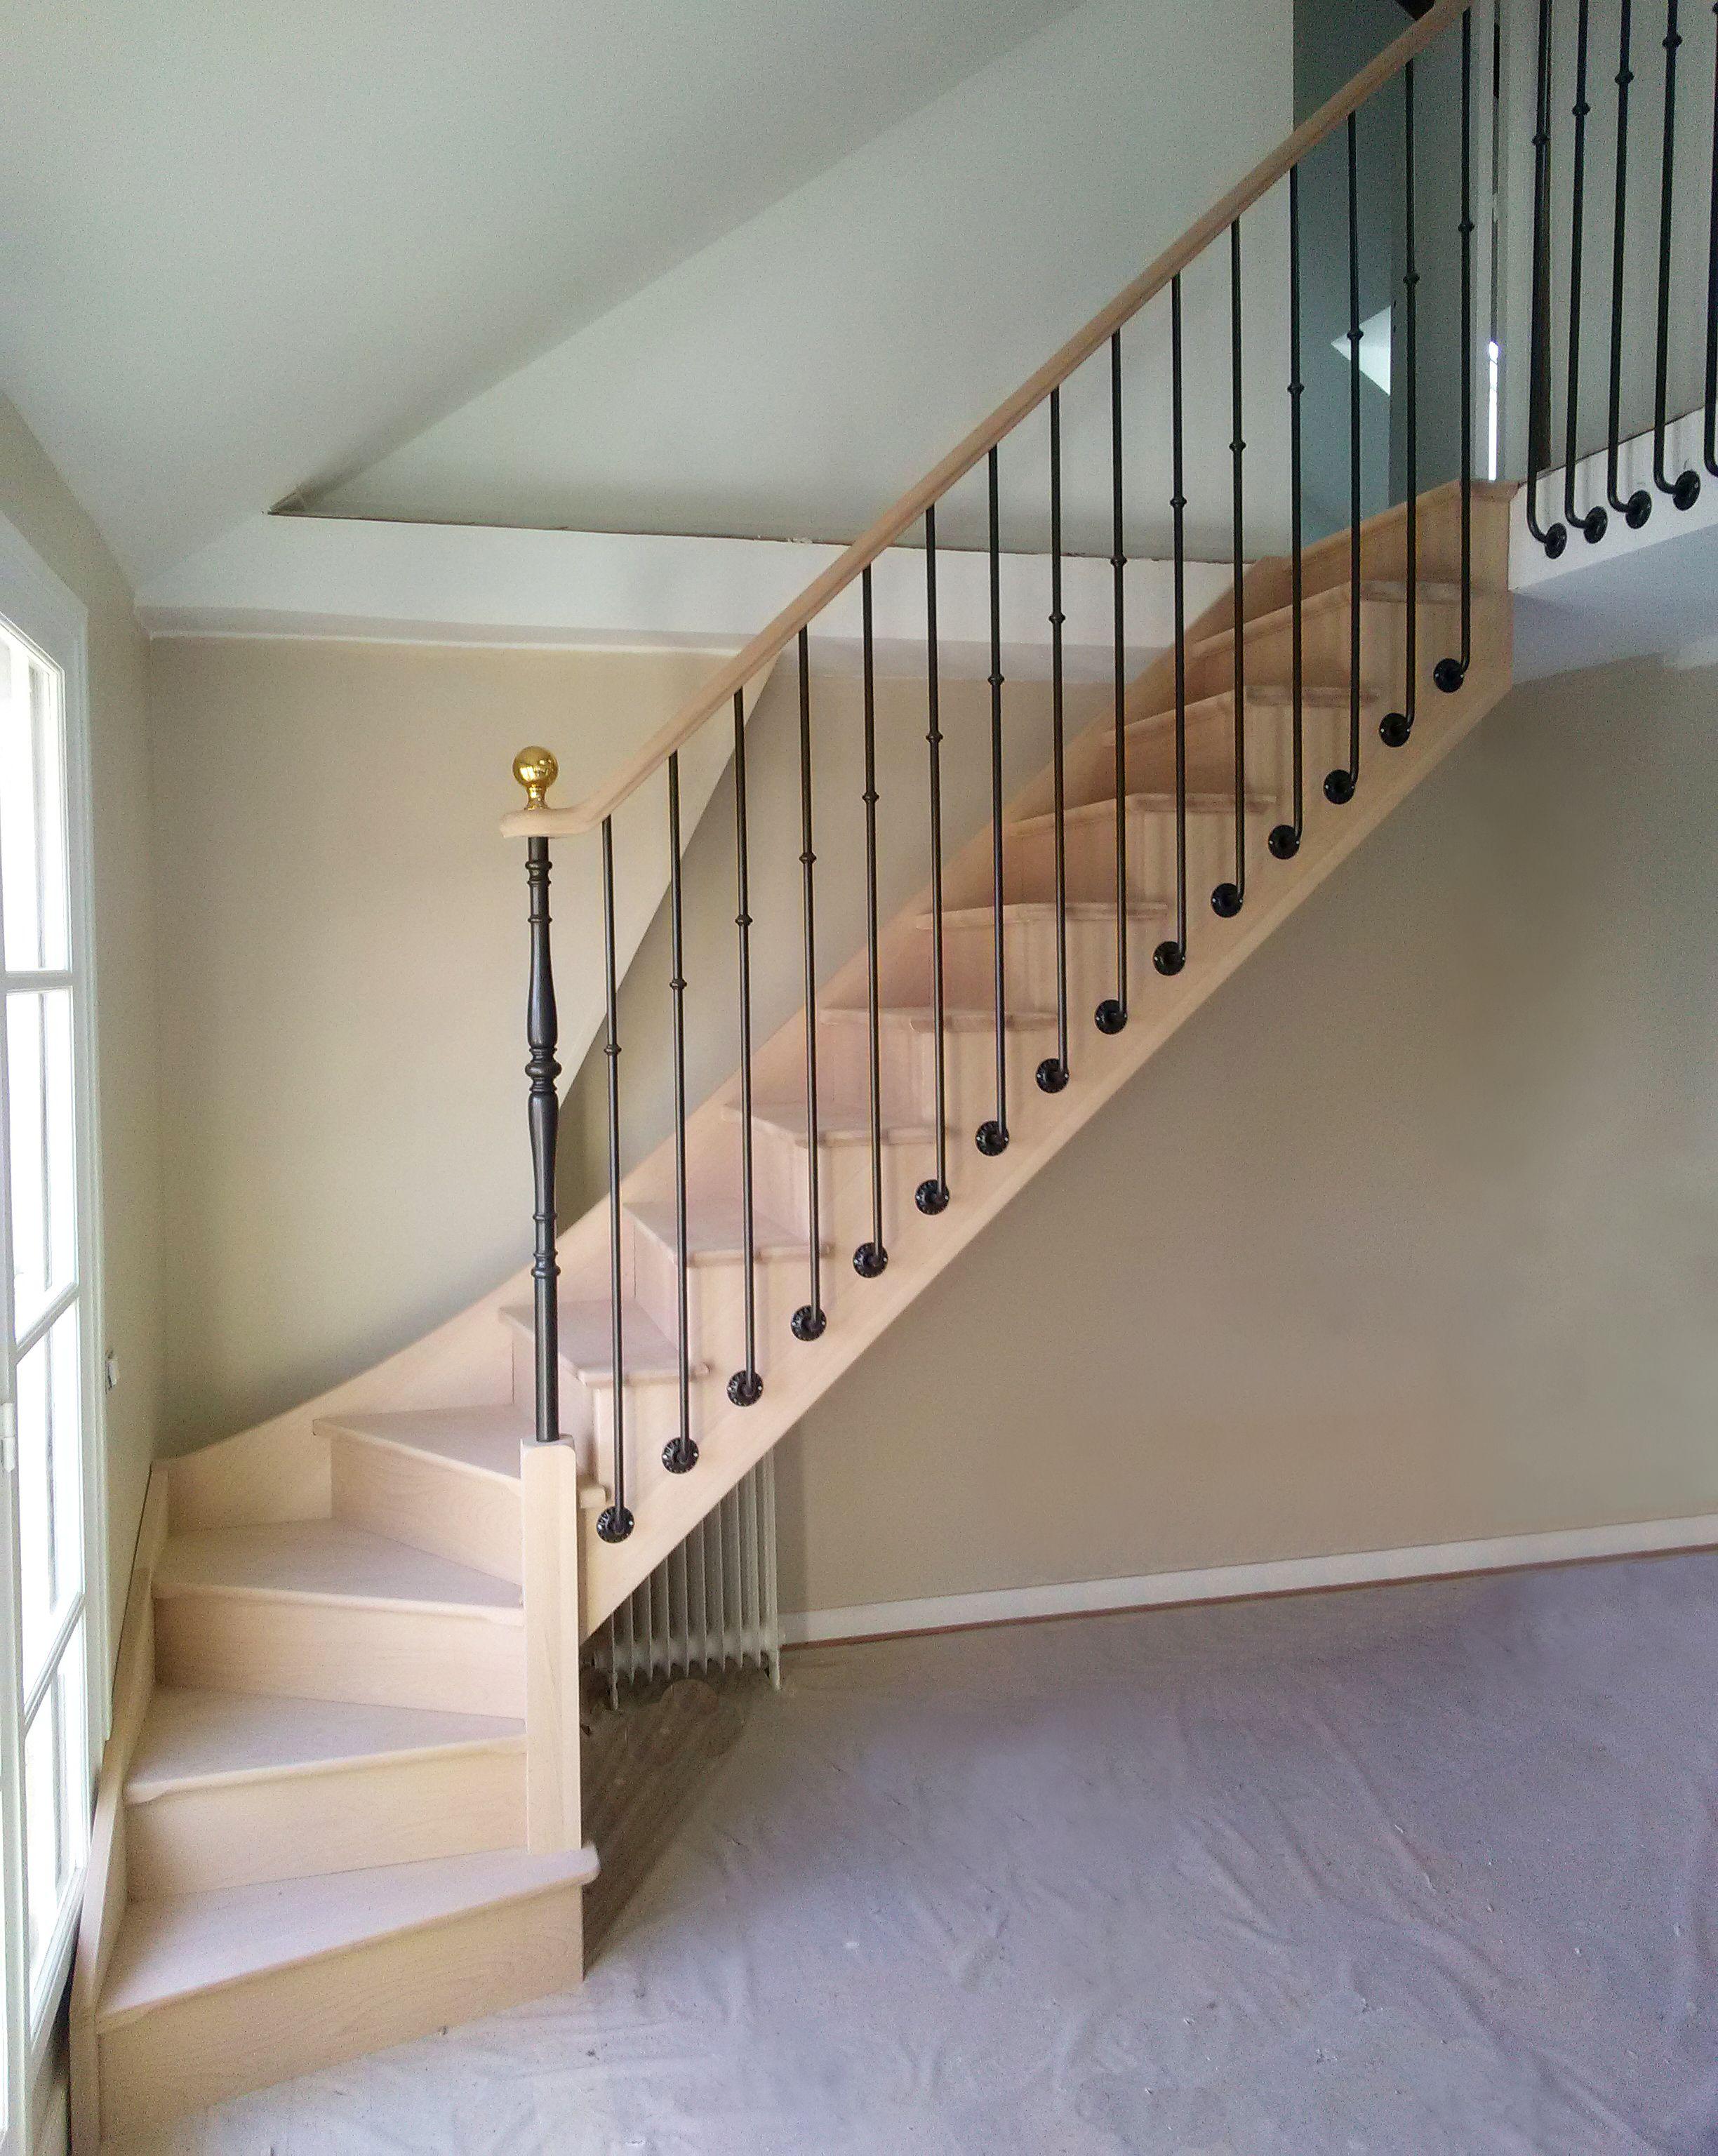 Escalier Quart Tournant En Hetre Avec Balustres Metalliques